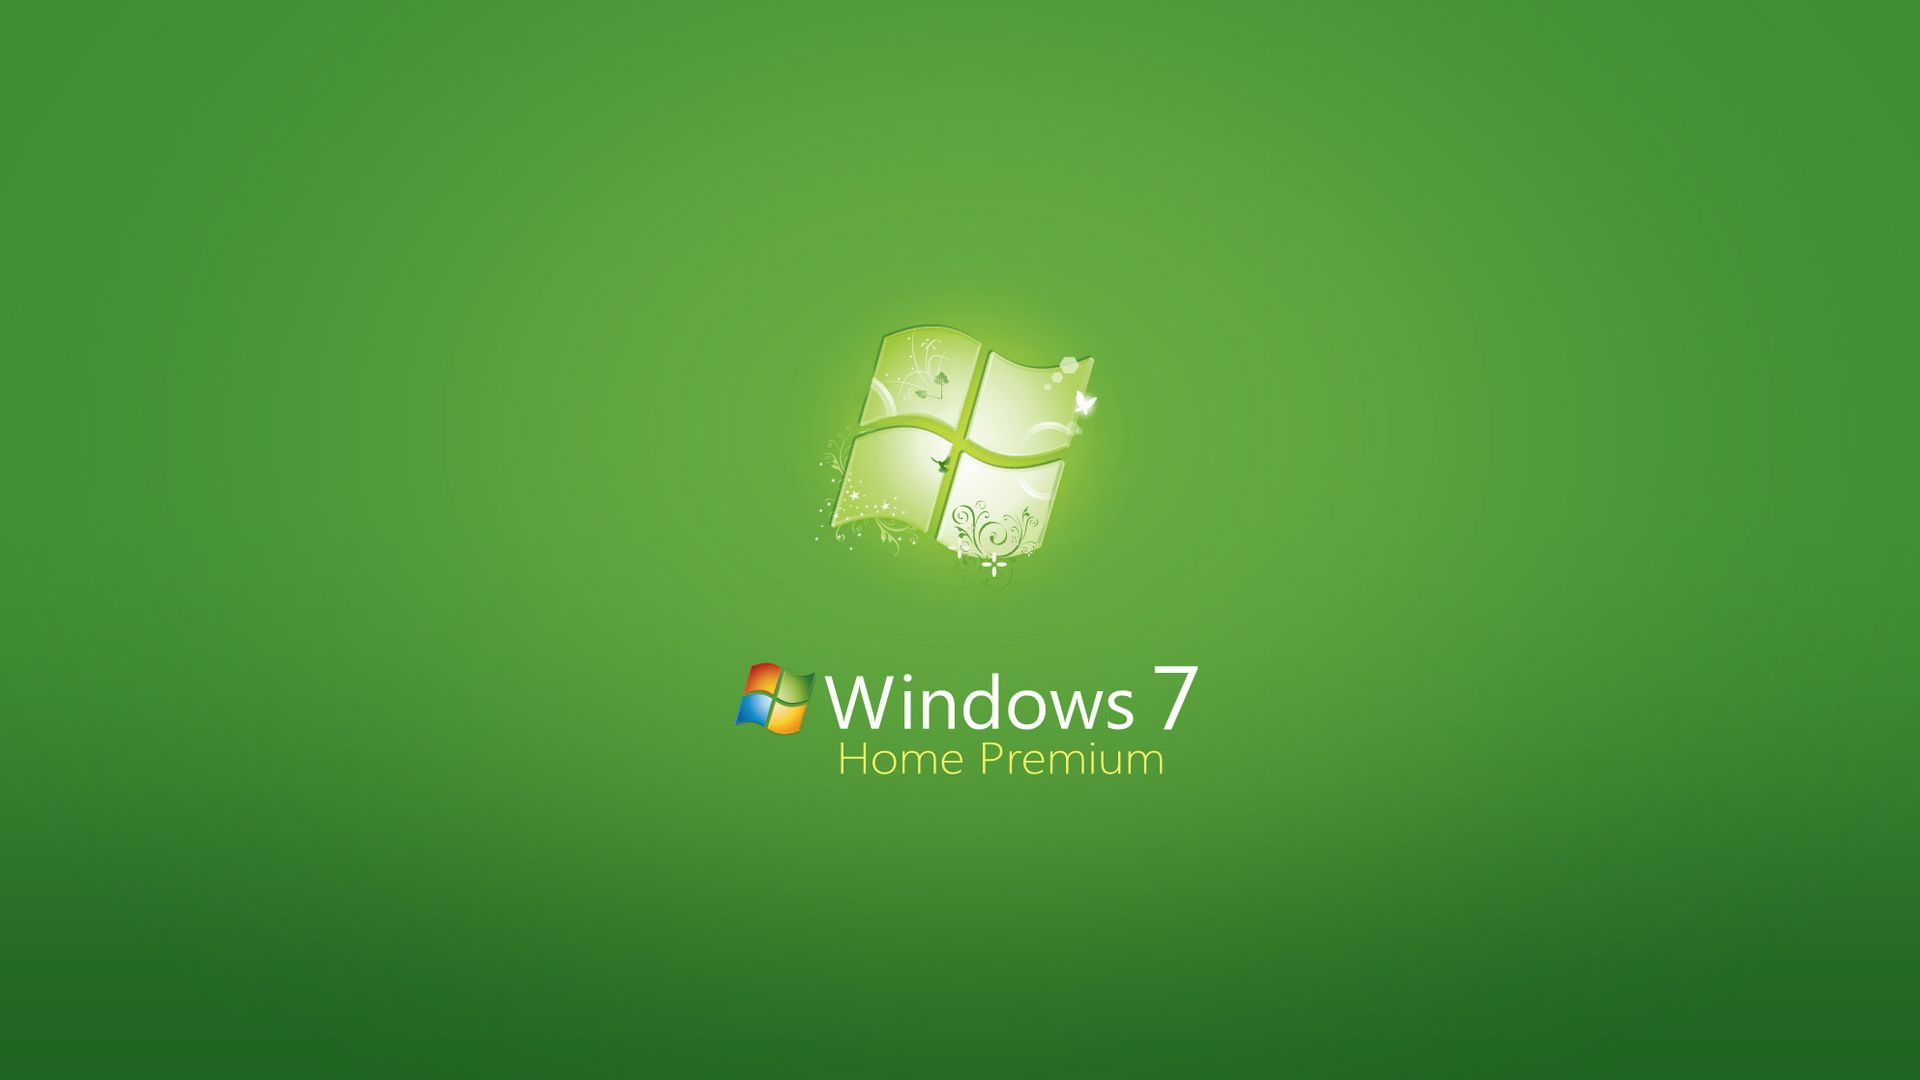 Windows 7 Home Basic Wallpaper Wallpapersafari